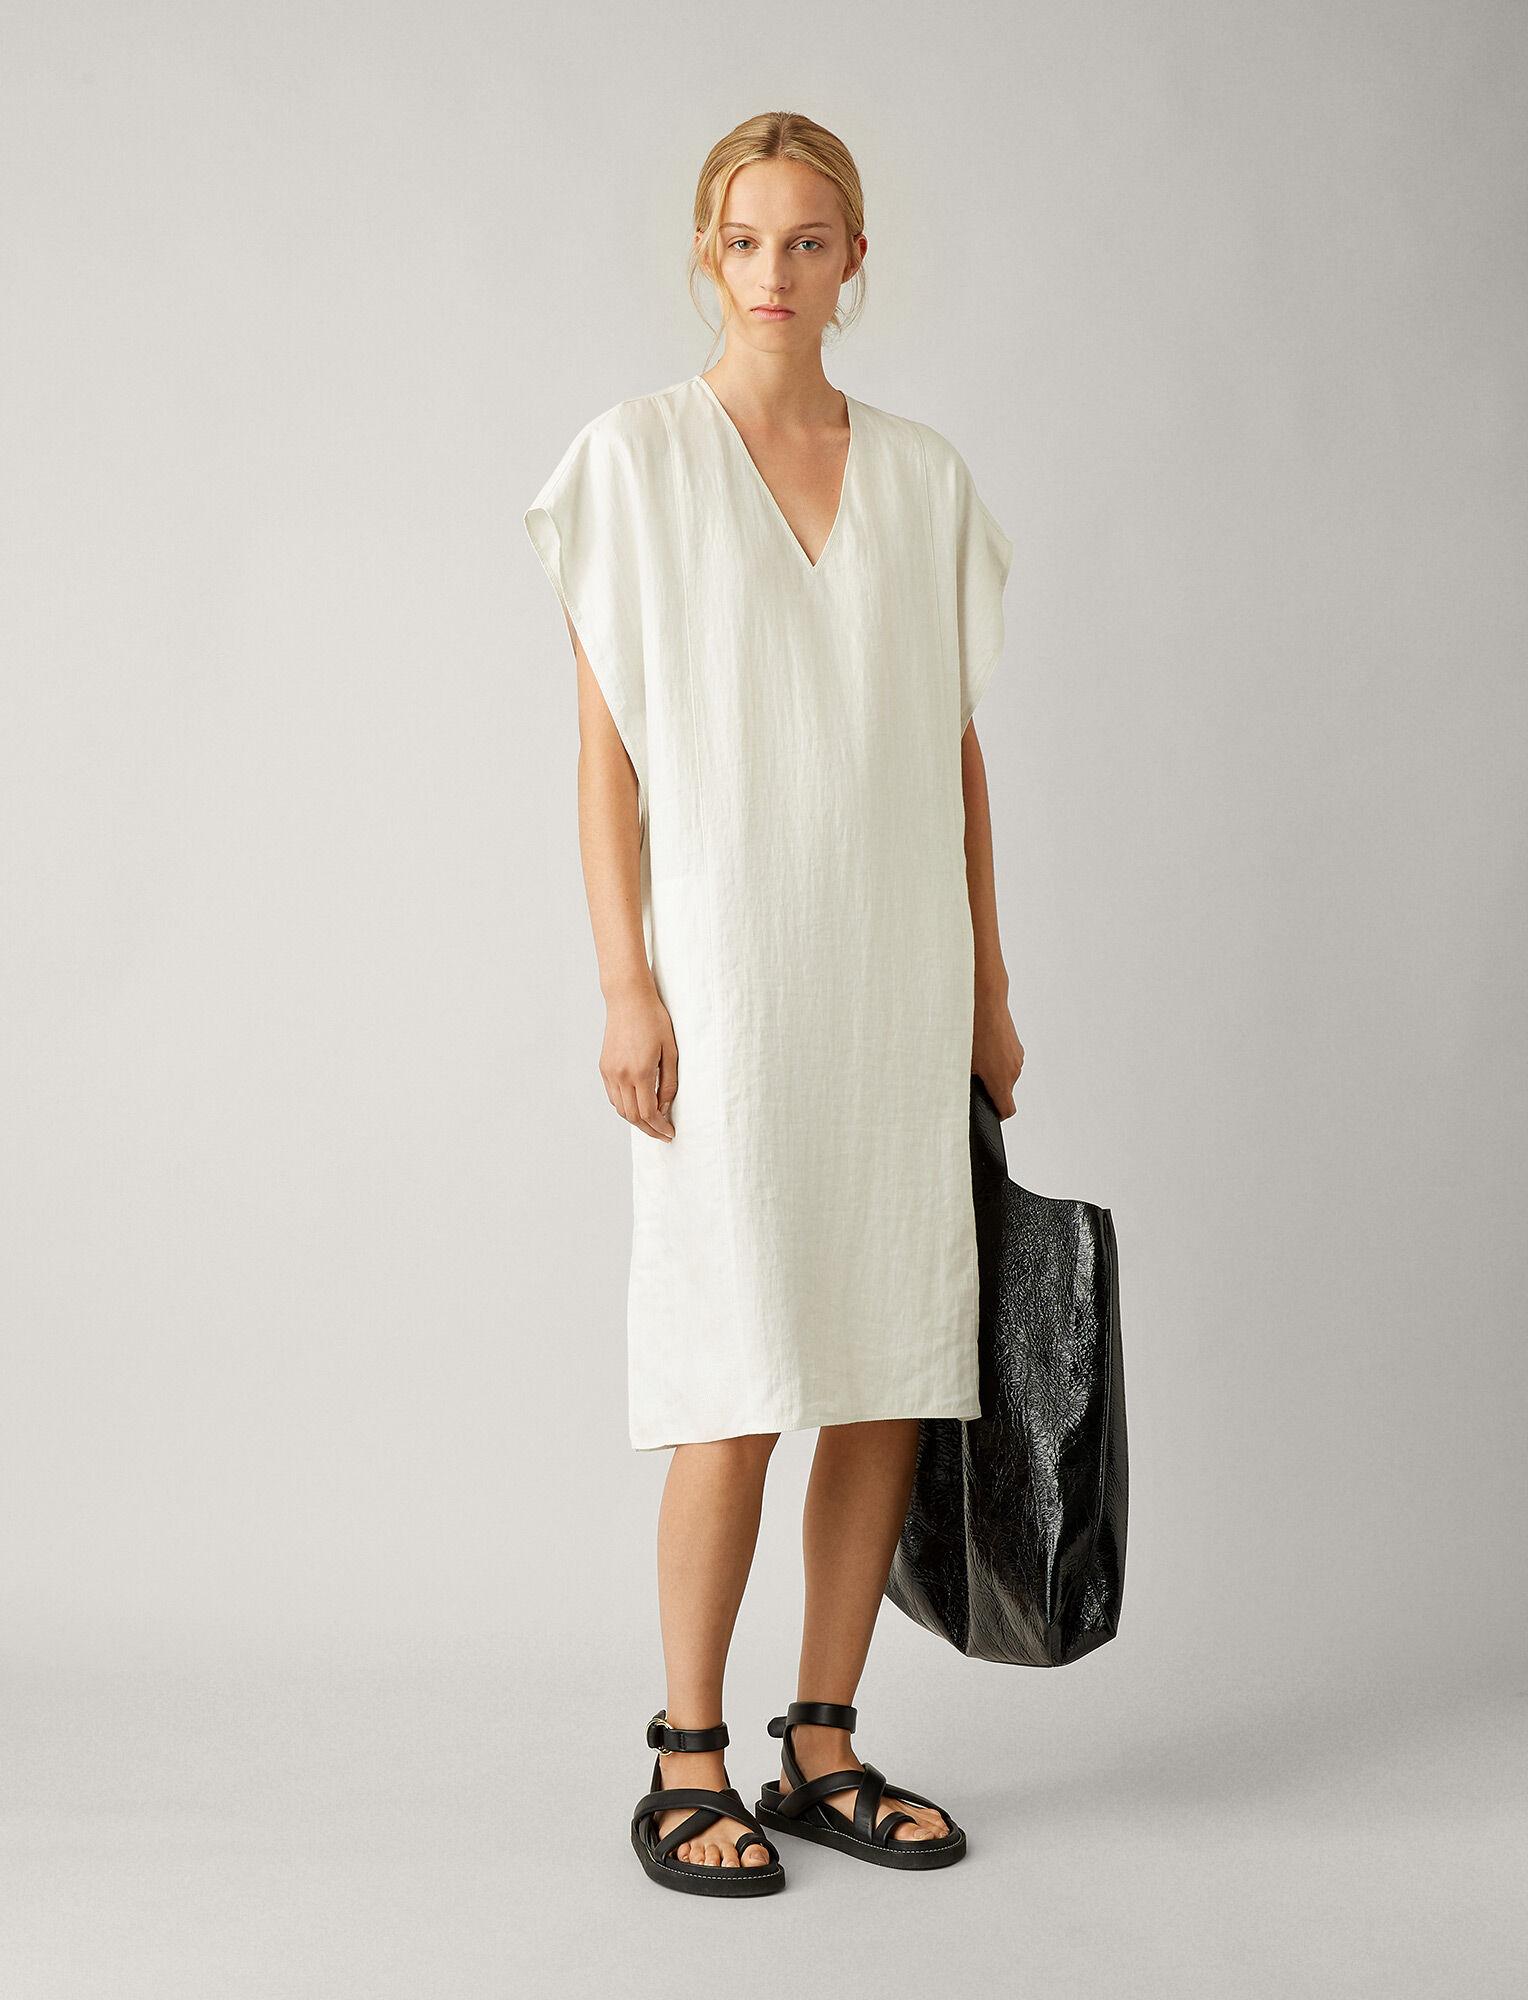 Joseph, Carr Chintz Linen Dress, in PEARL